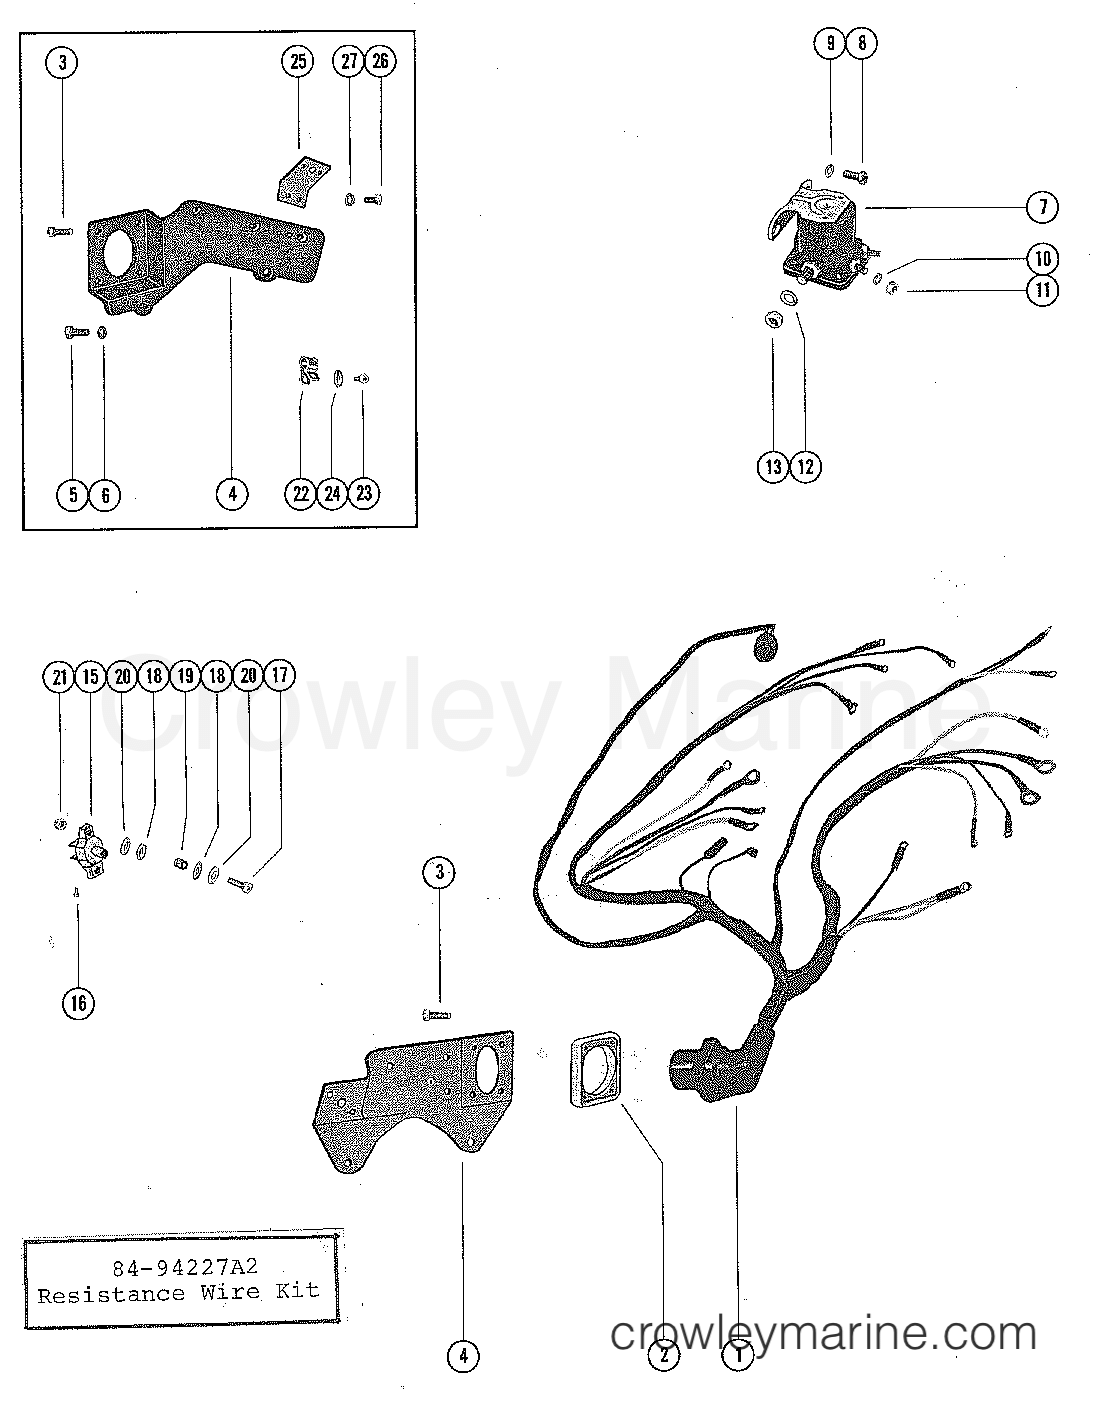 Ford 351 Wiring Harnes Diagram